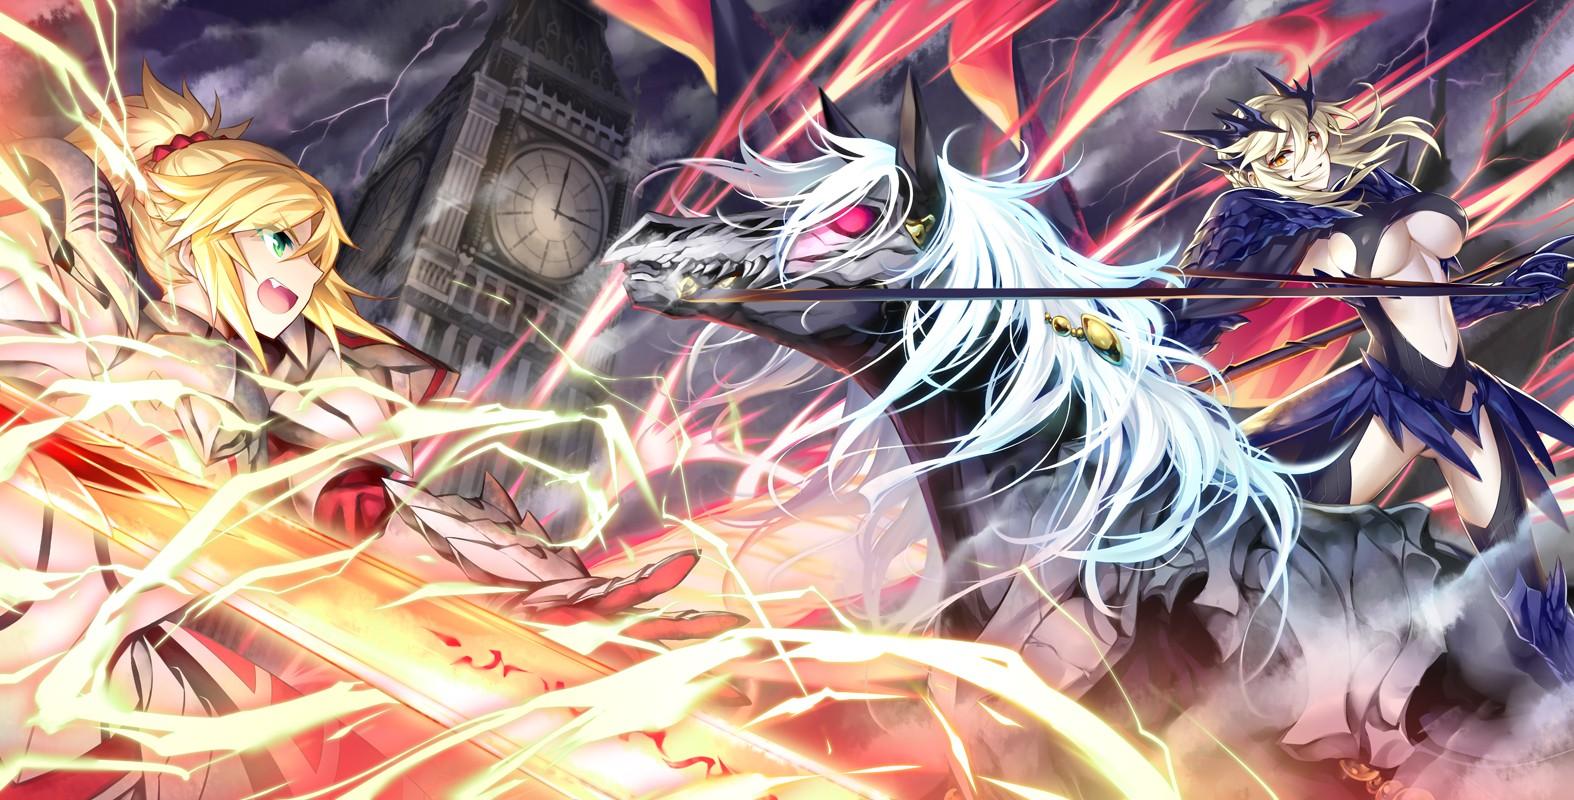 Wallpaper Anime Horse Sword Saber Fate Grand Order Fate